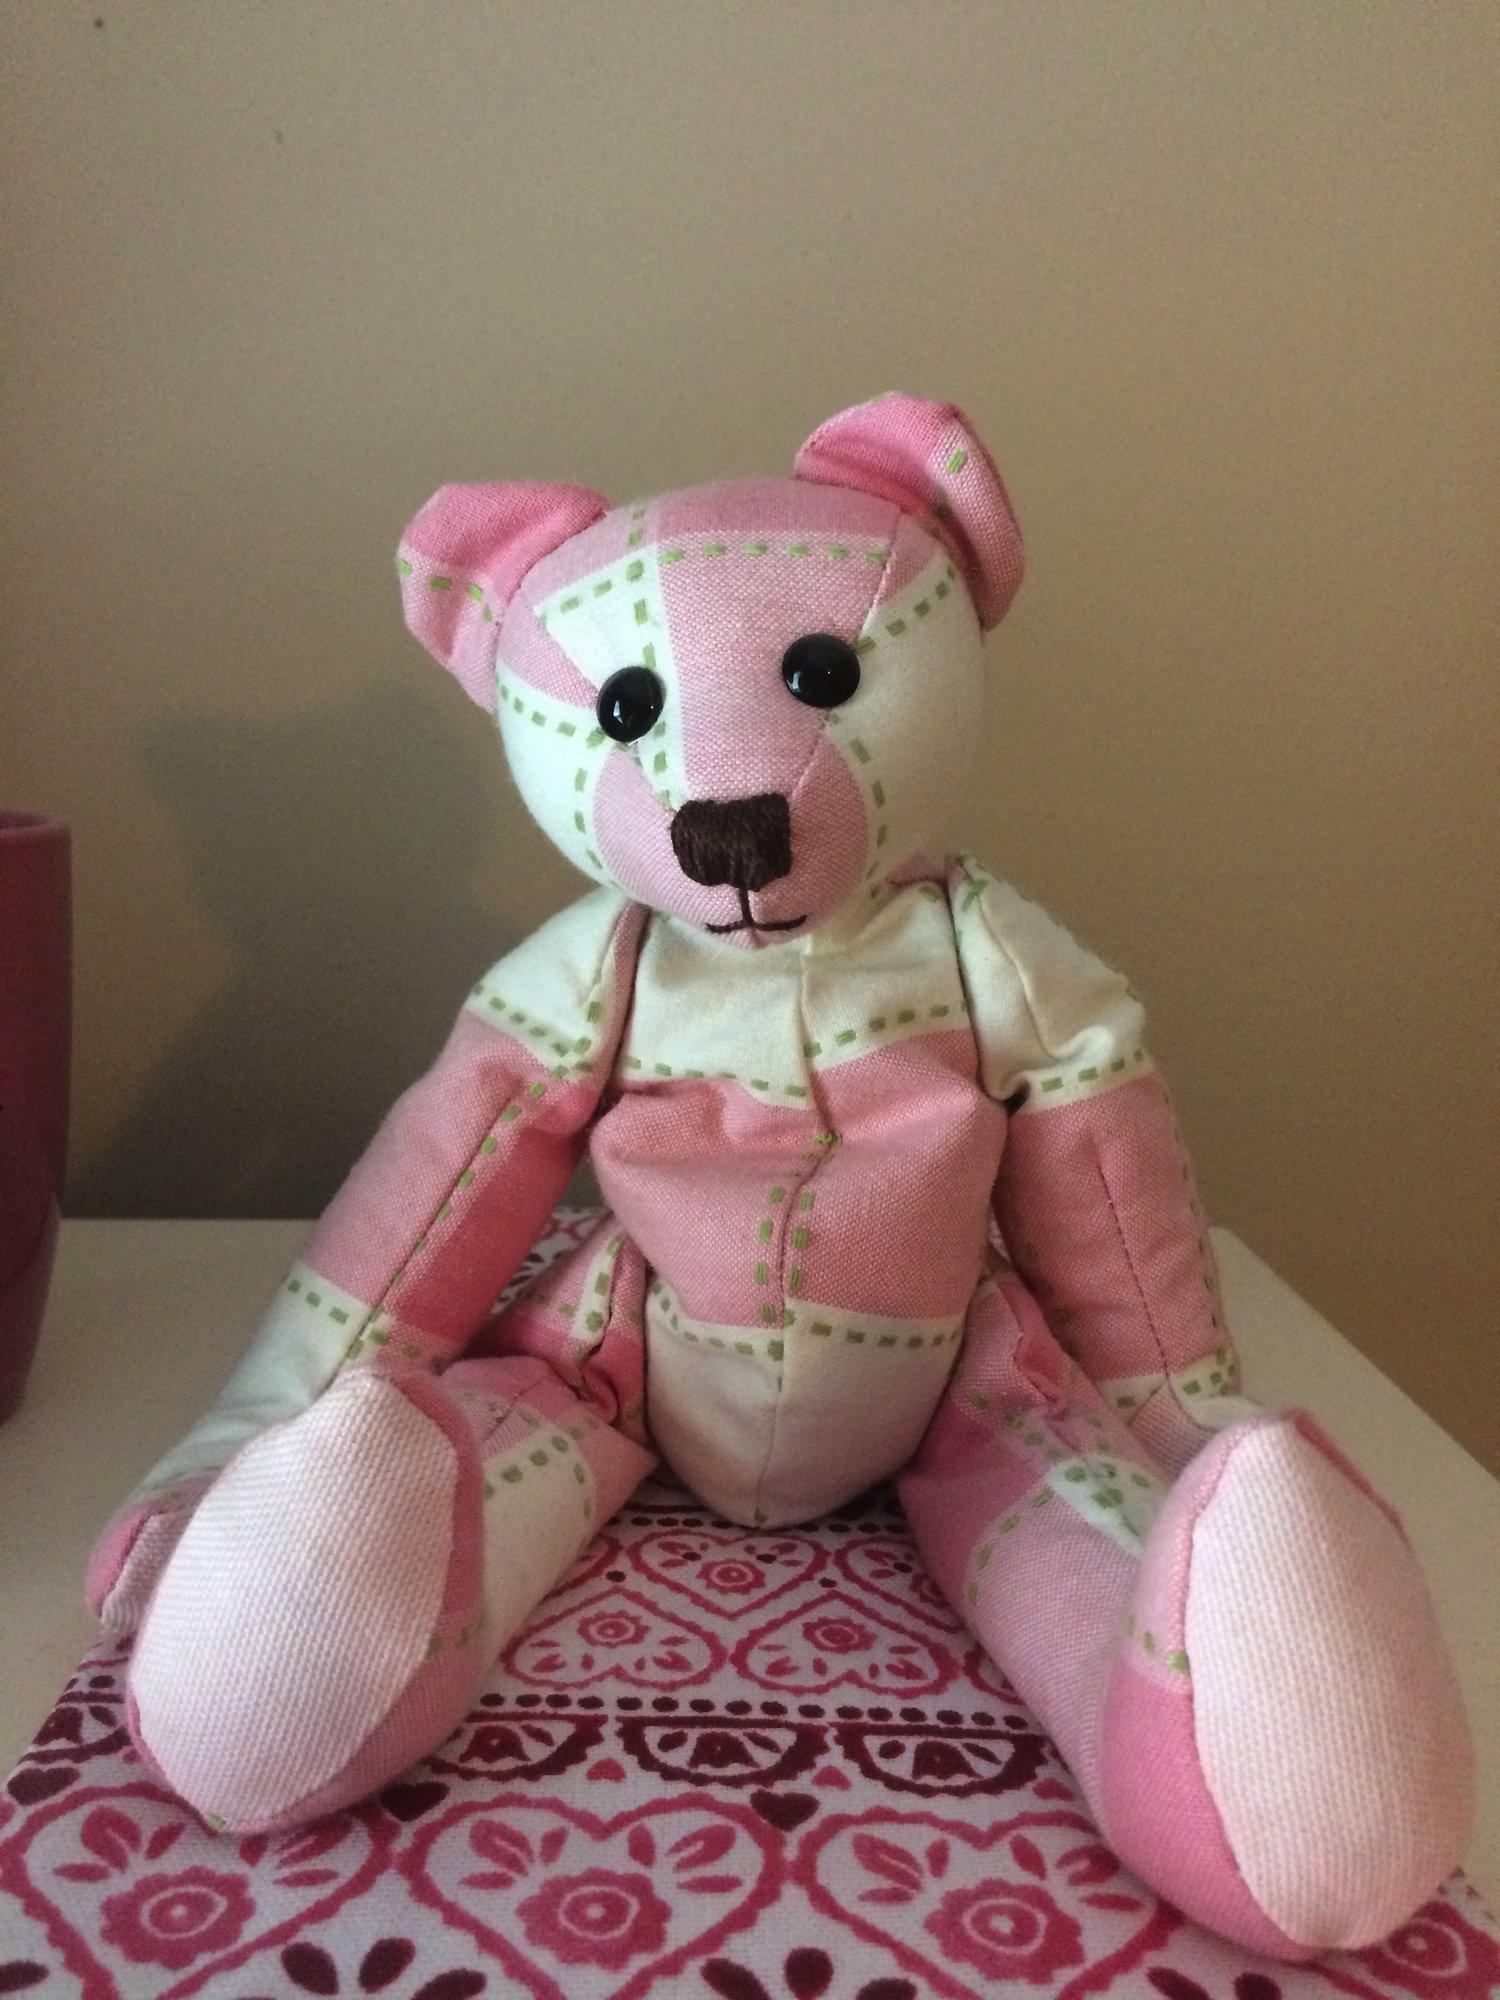 Teddy.jpeg